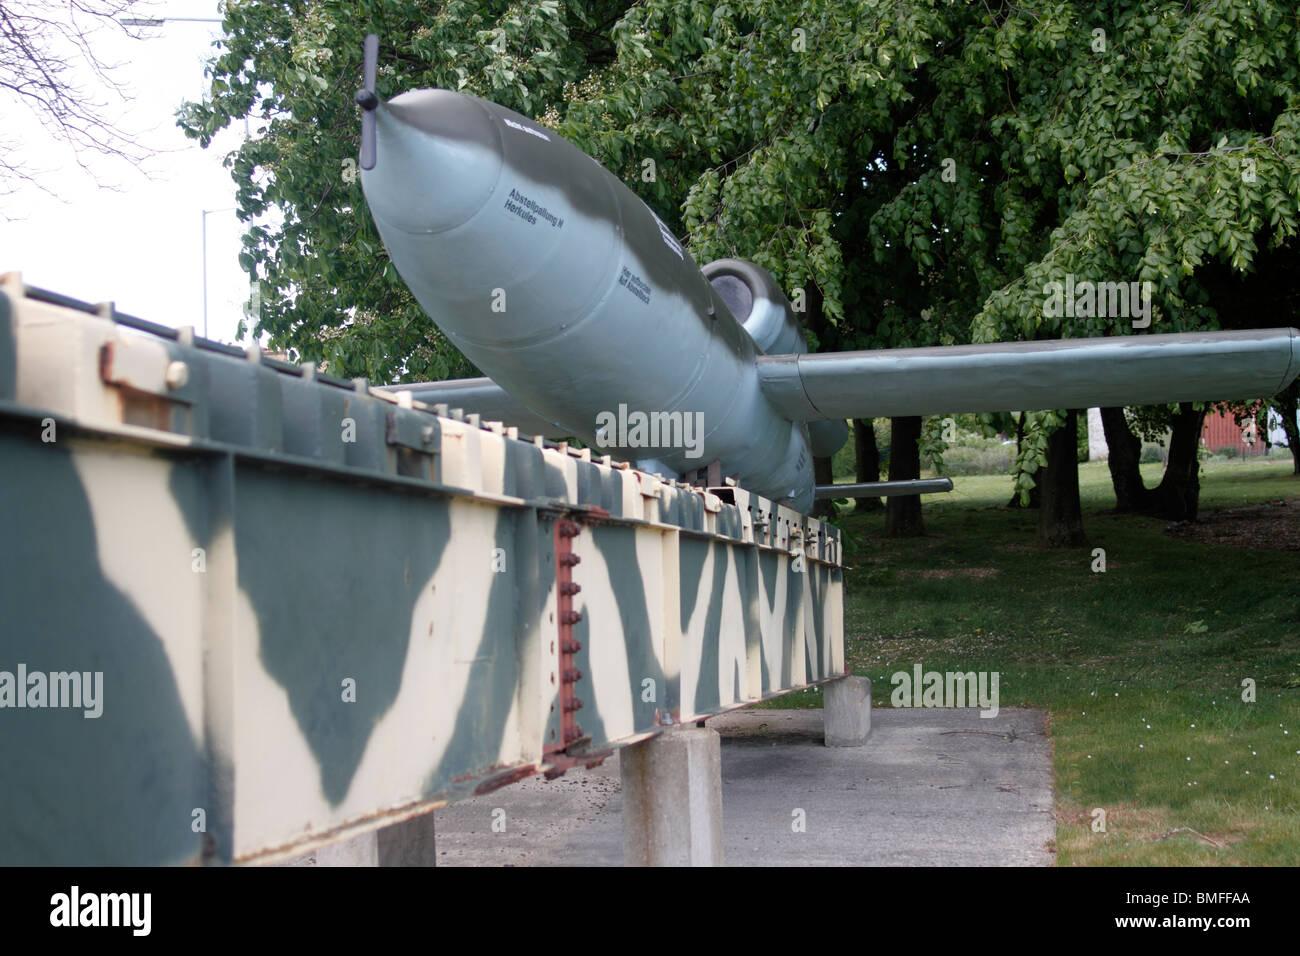 833rd aero squadron - V1 Flying Bomb Verheltingswaffe Reprisal Weapon 1 Duxford Aero Museum Part